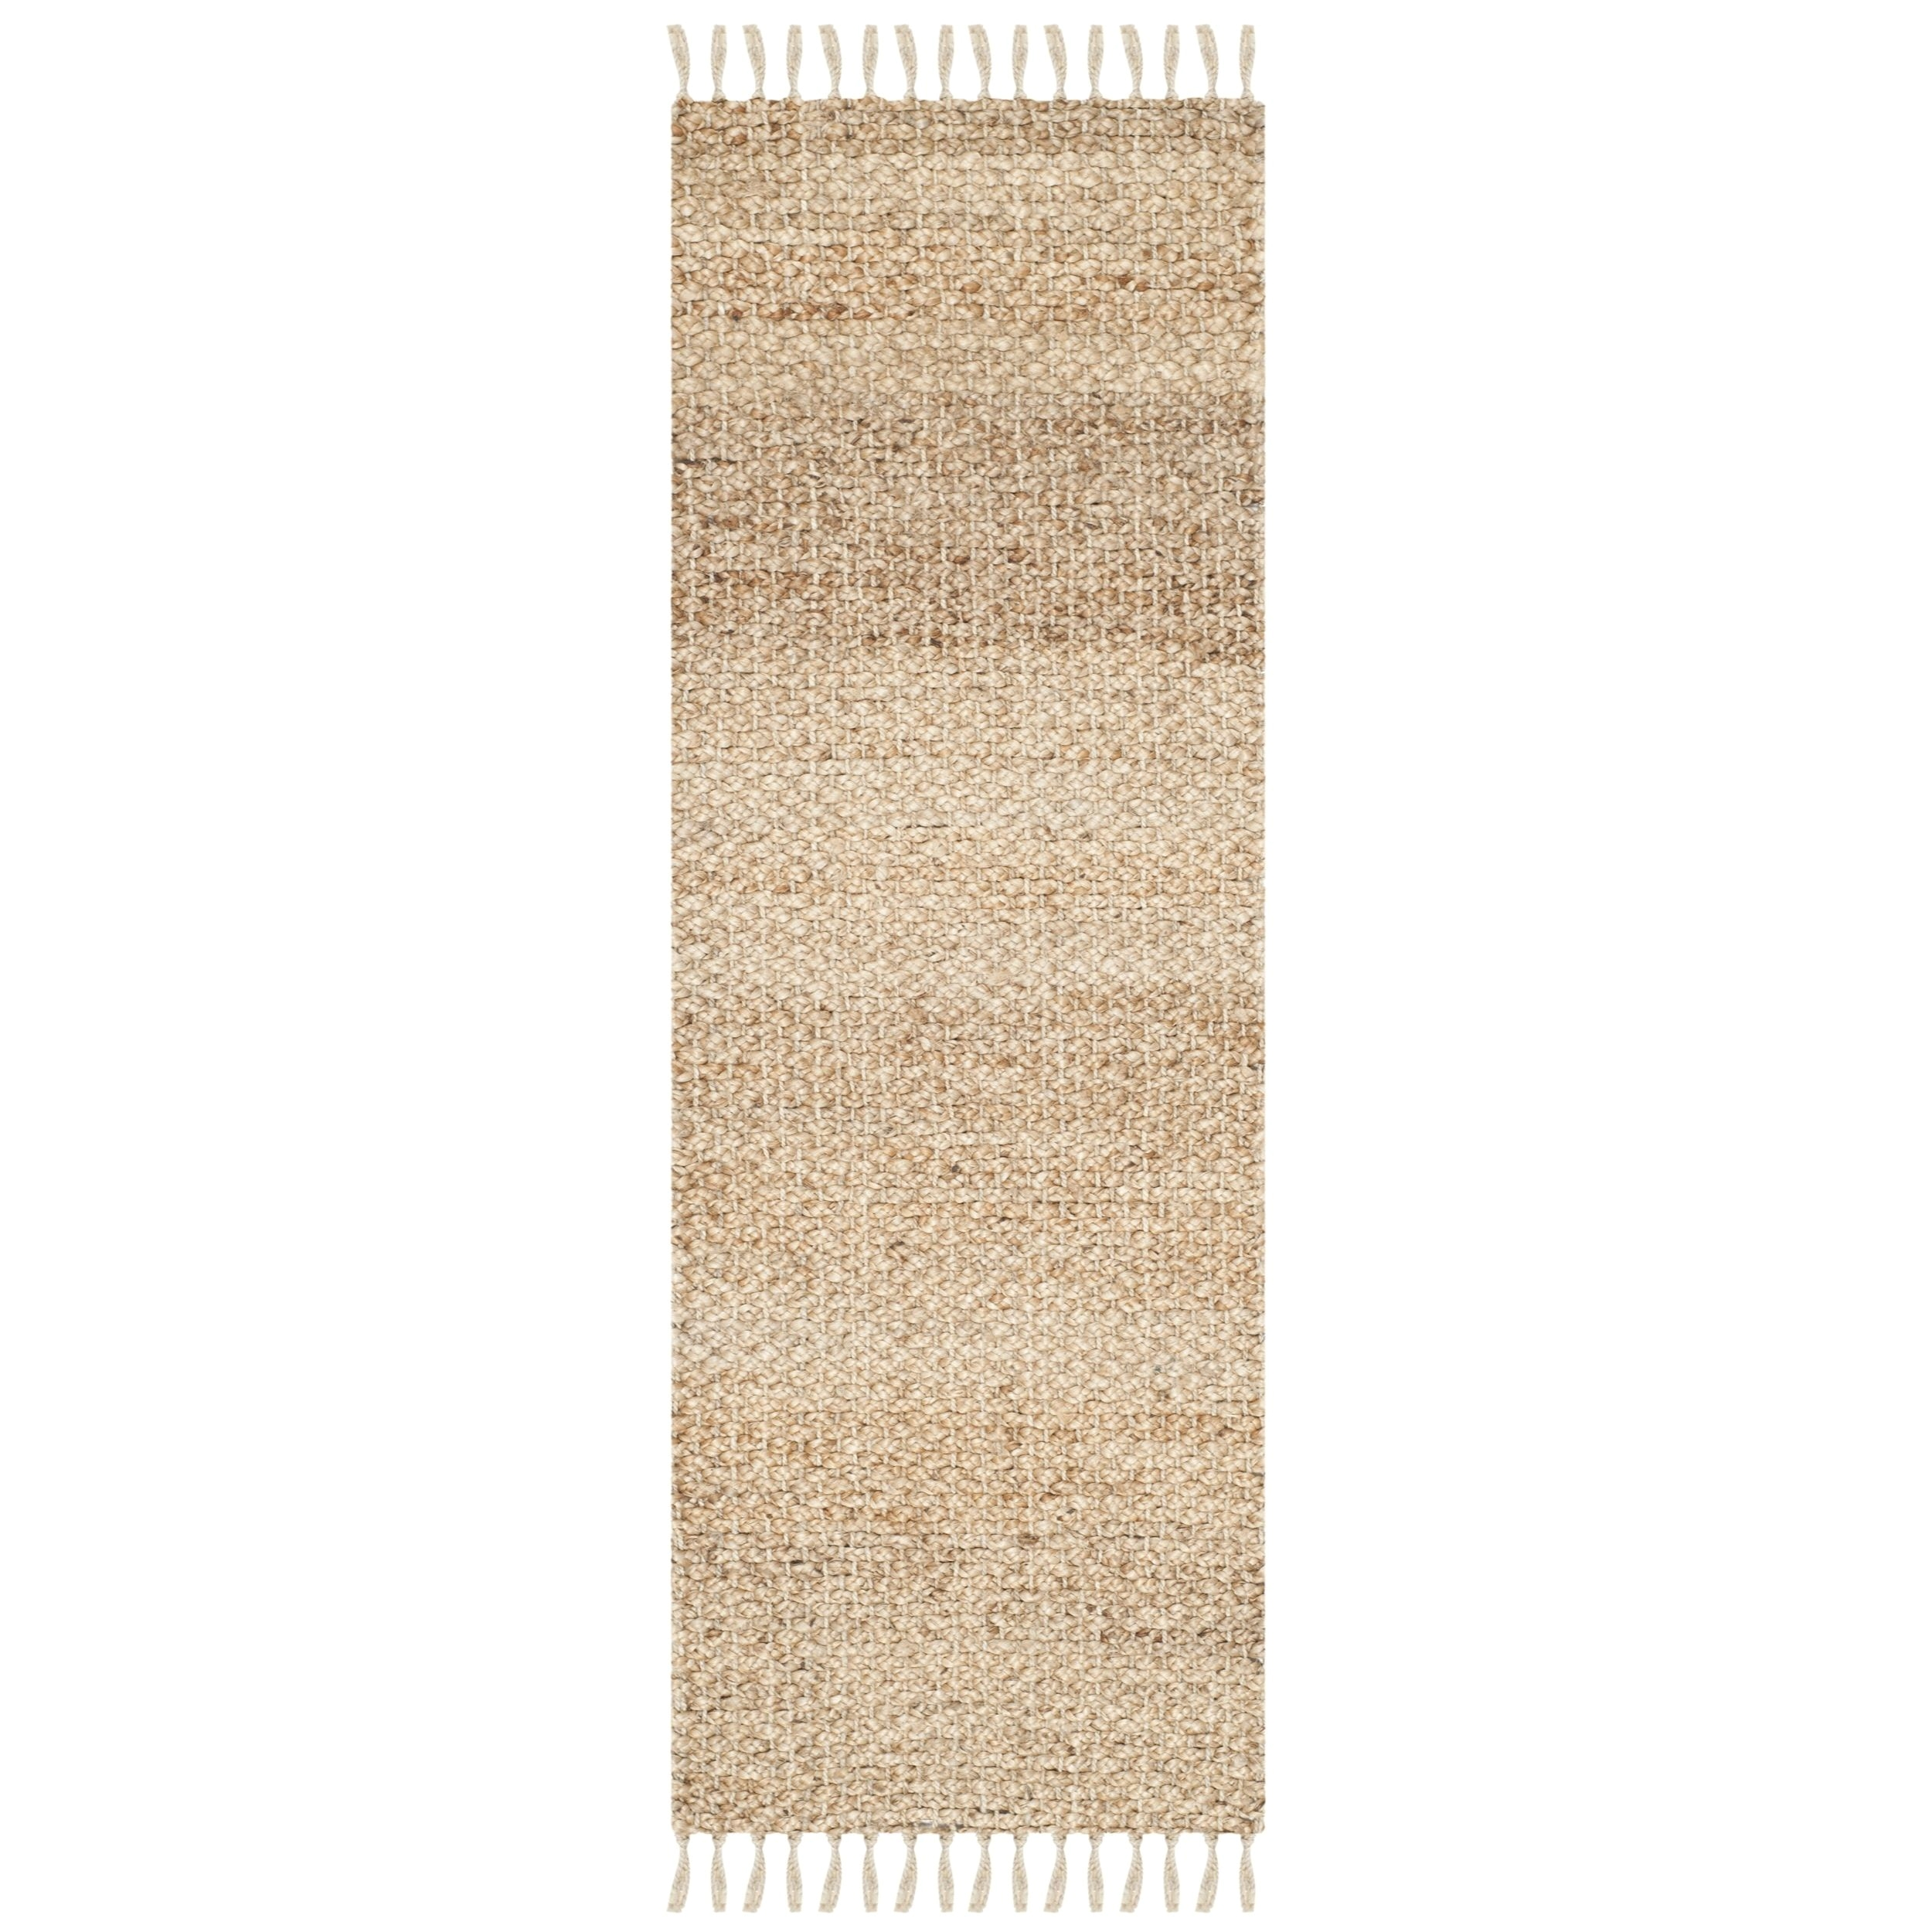 safavieh casual natural fiber hand loomed sisal style natural jute runner rug 2